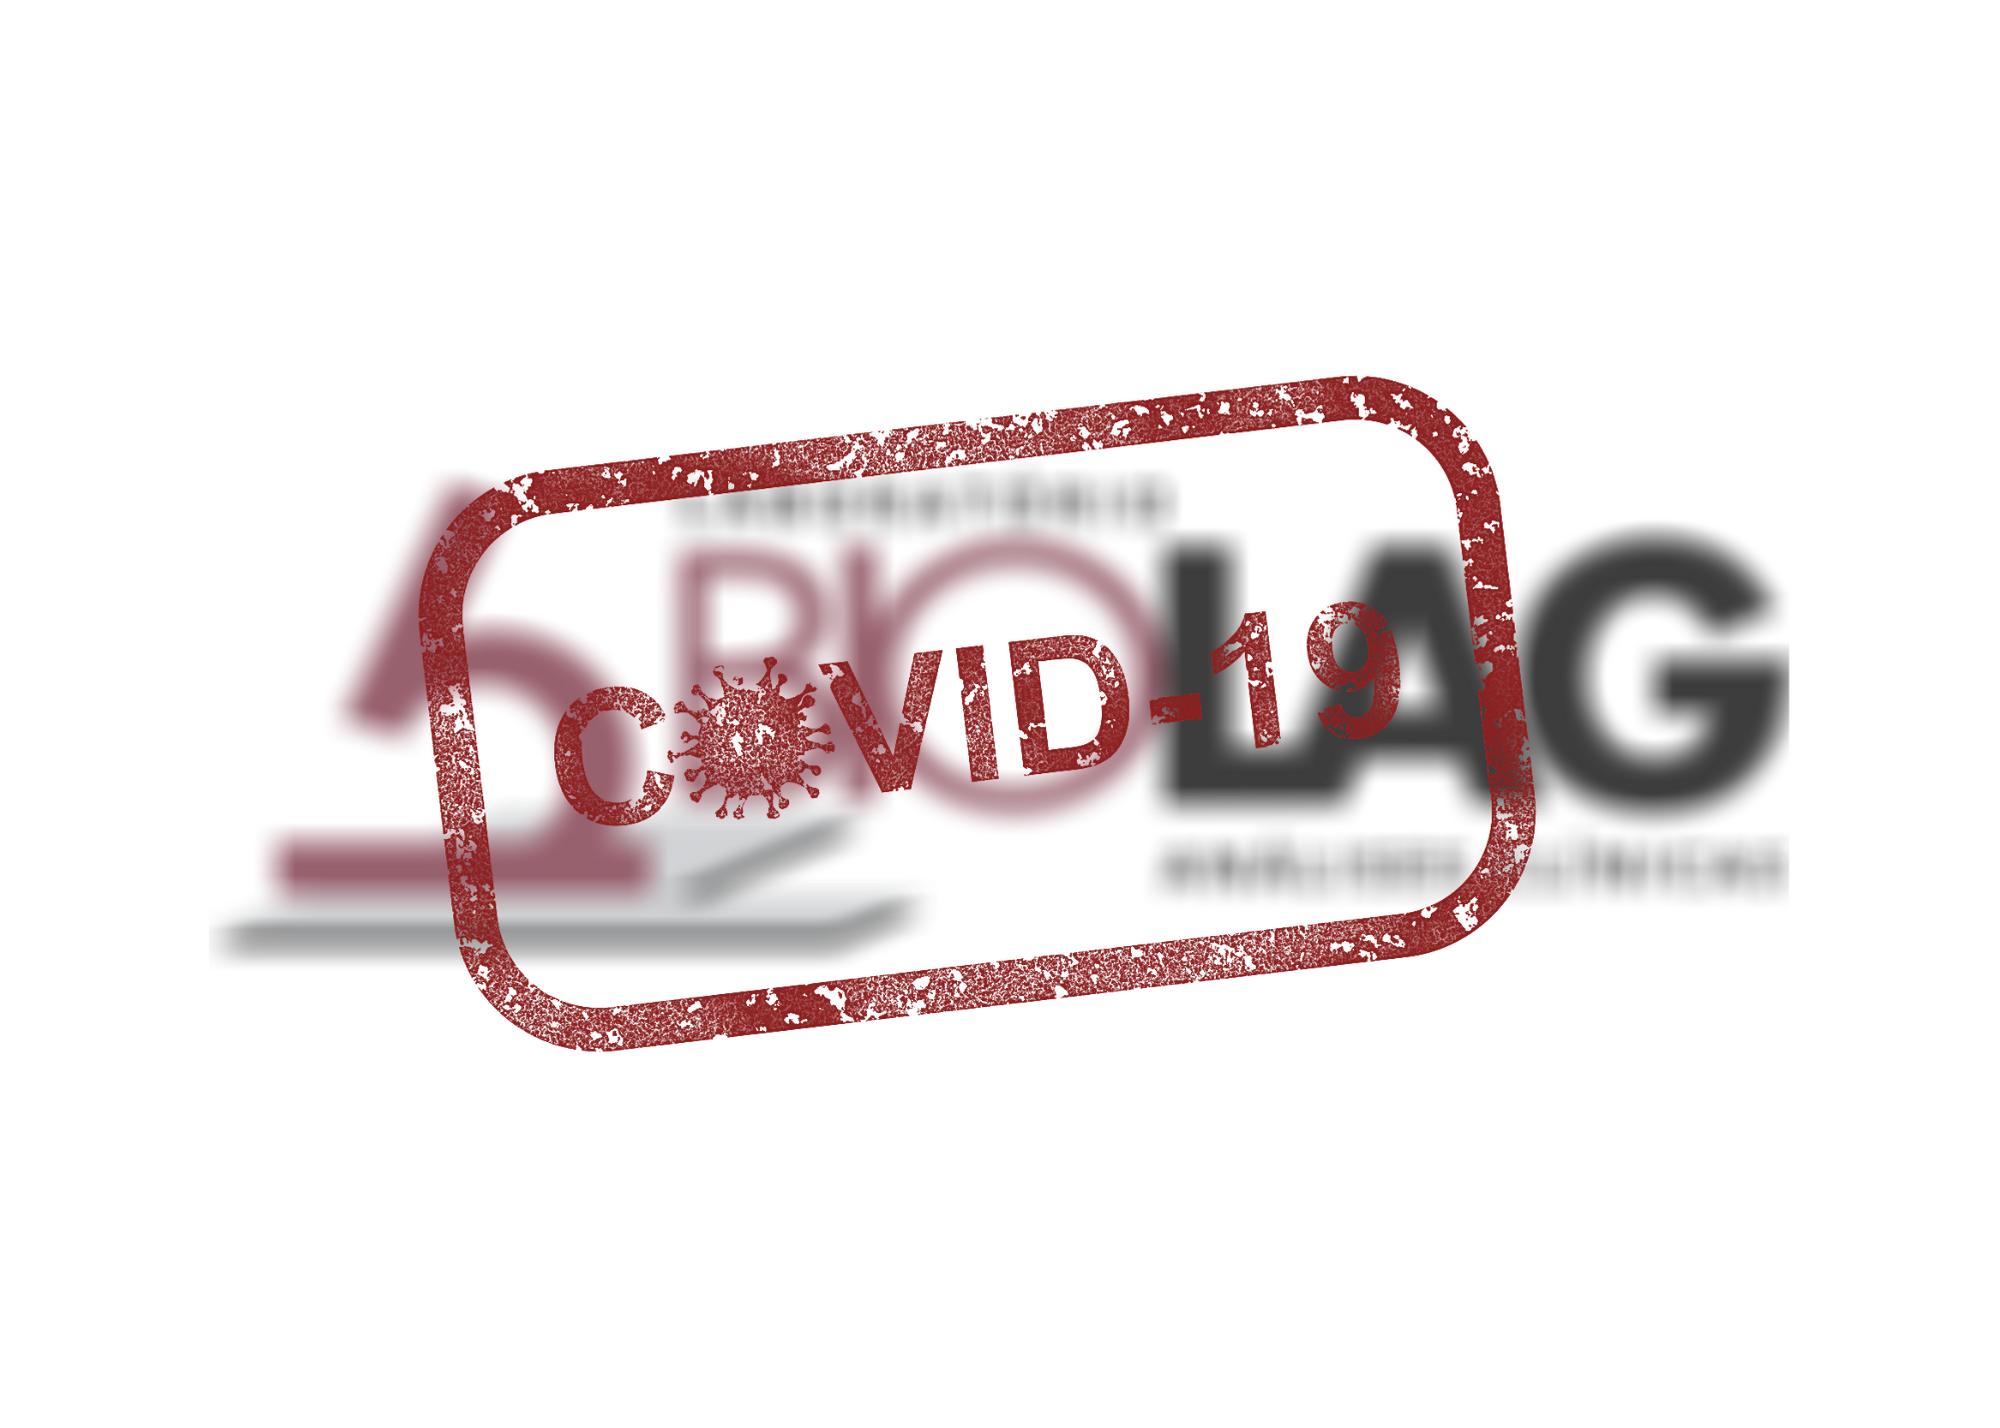 Laboratório Biolag frente ao coronavírus (COVID-19)